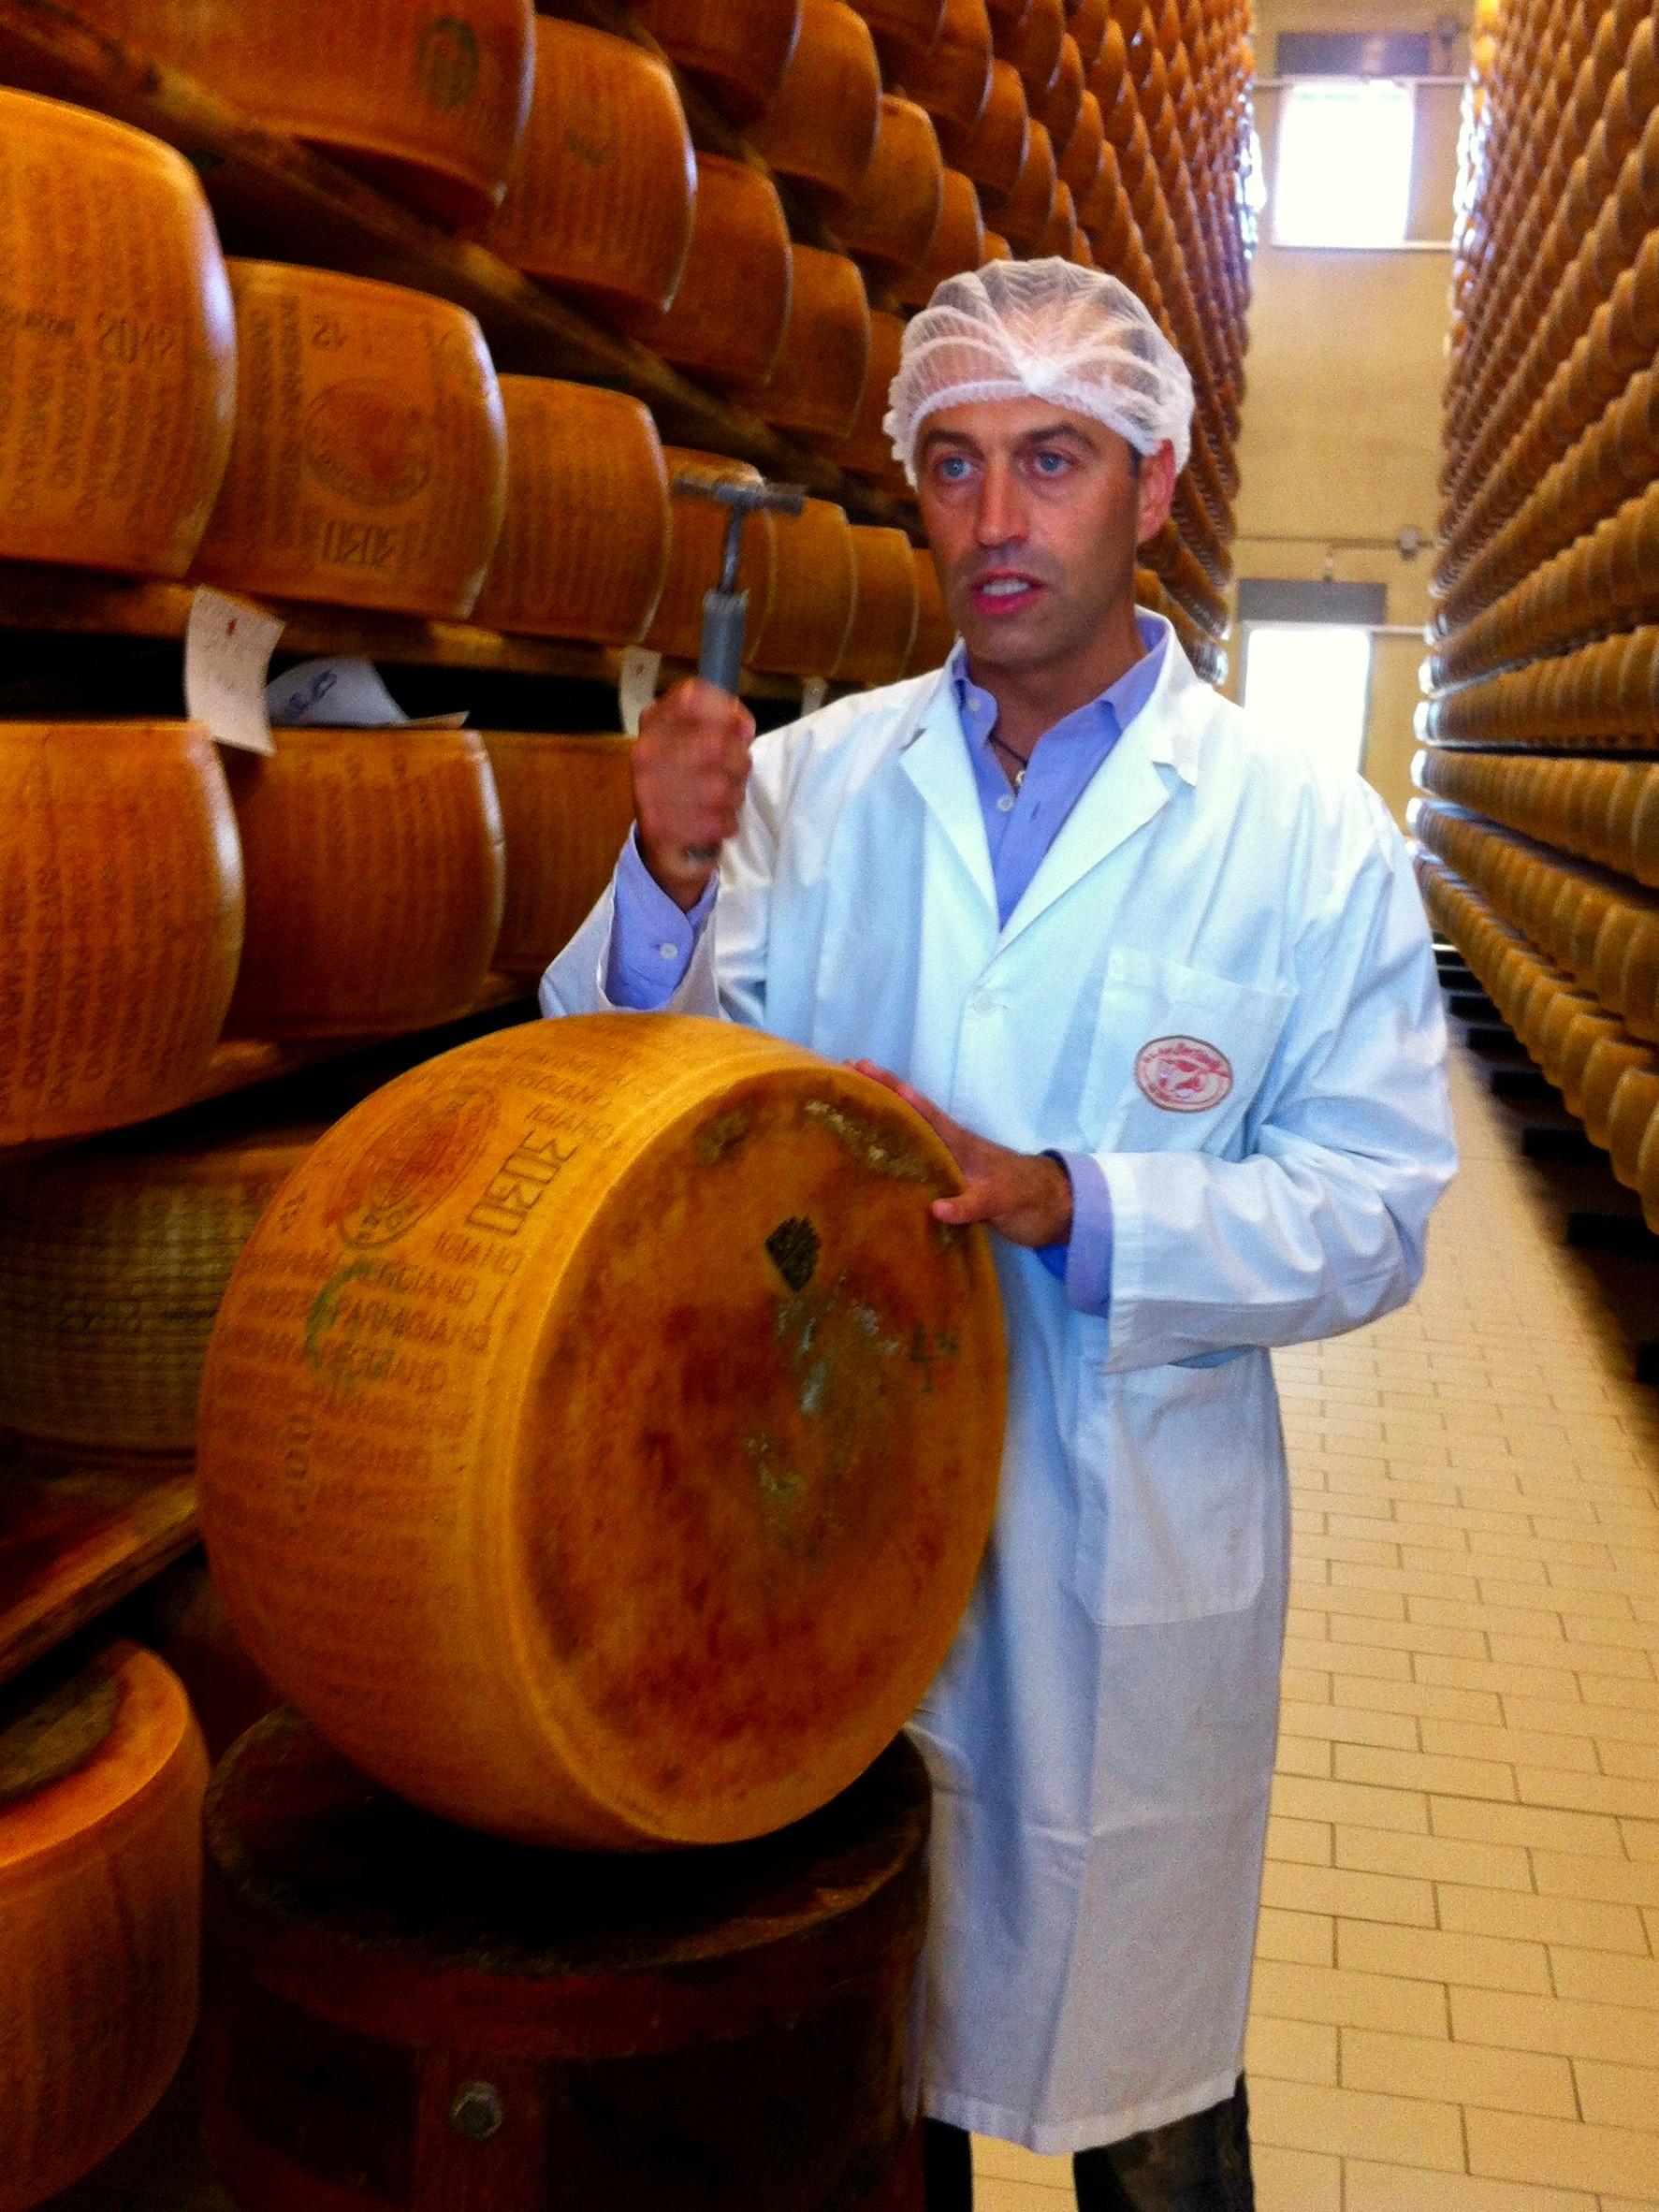 Parmigiano Reggiano DOP visits and tasting